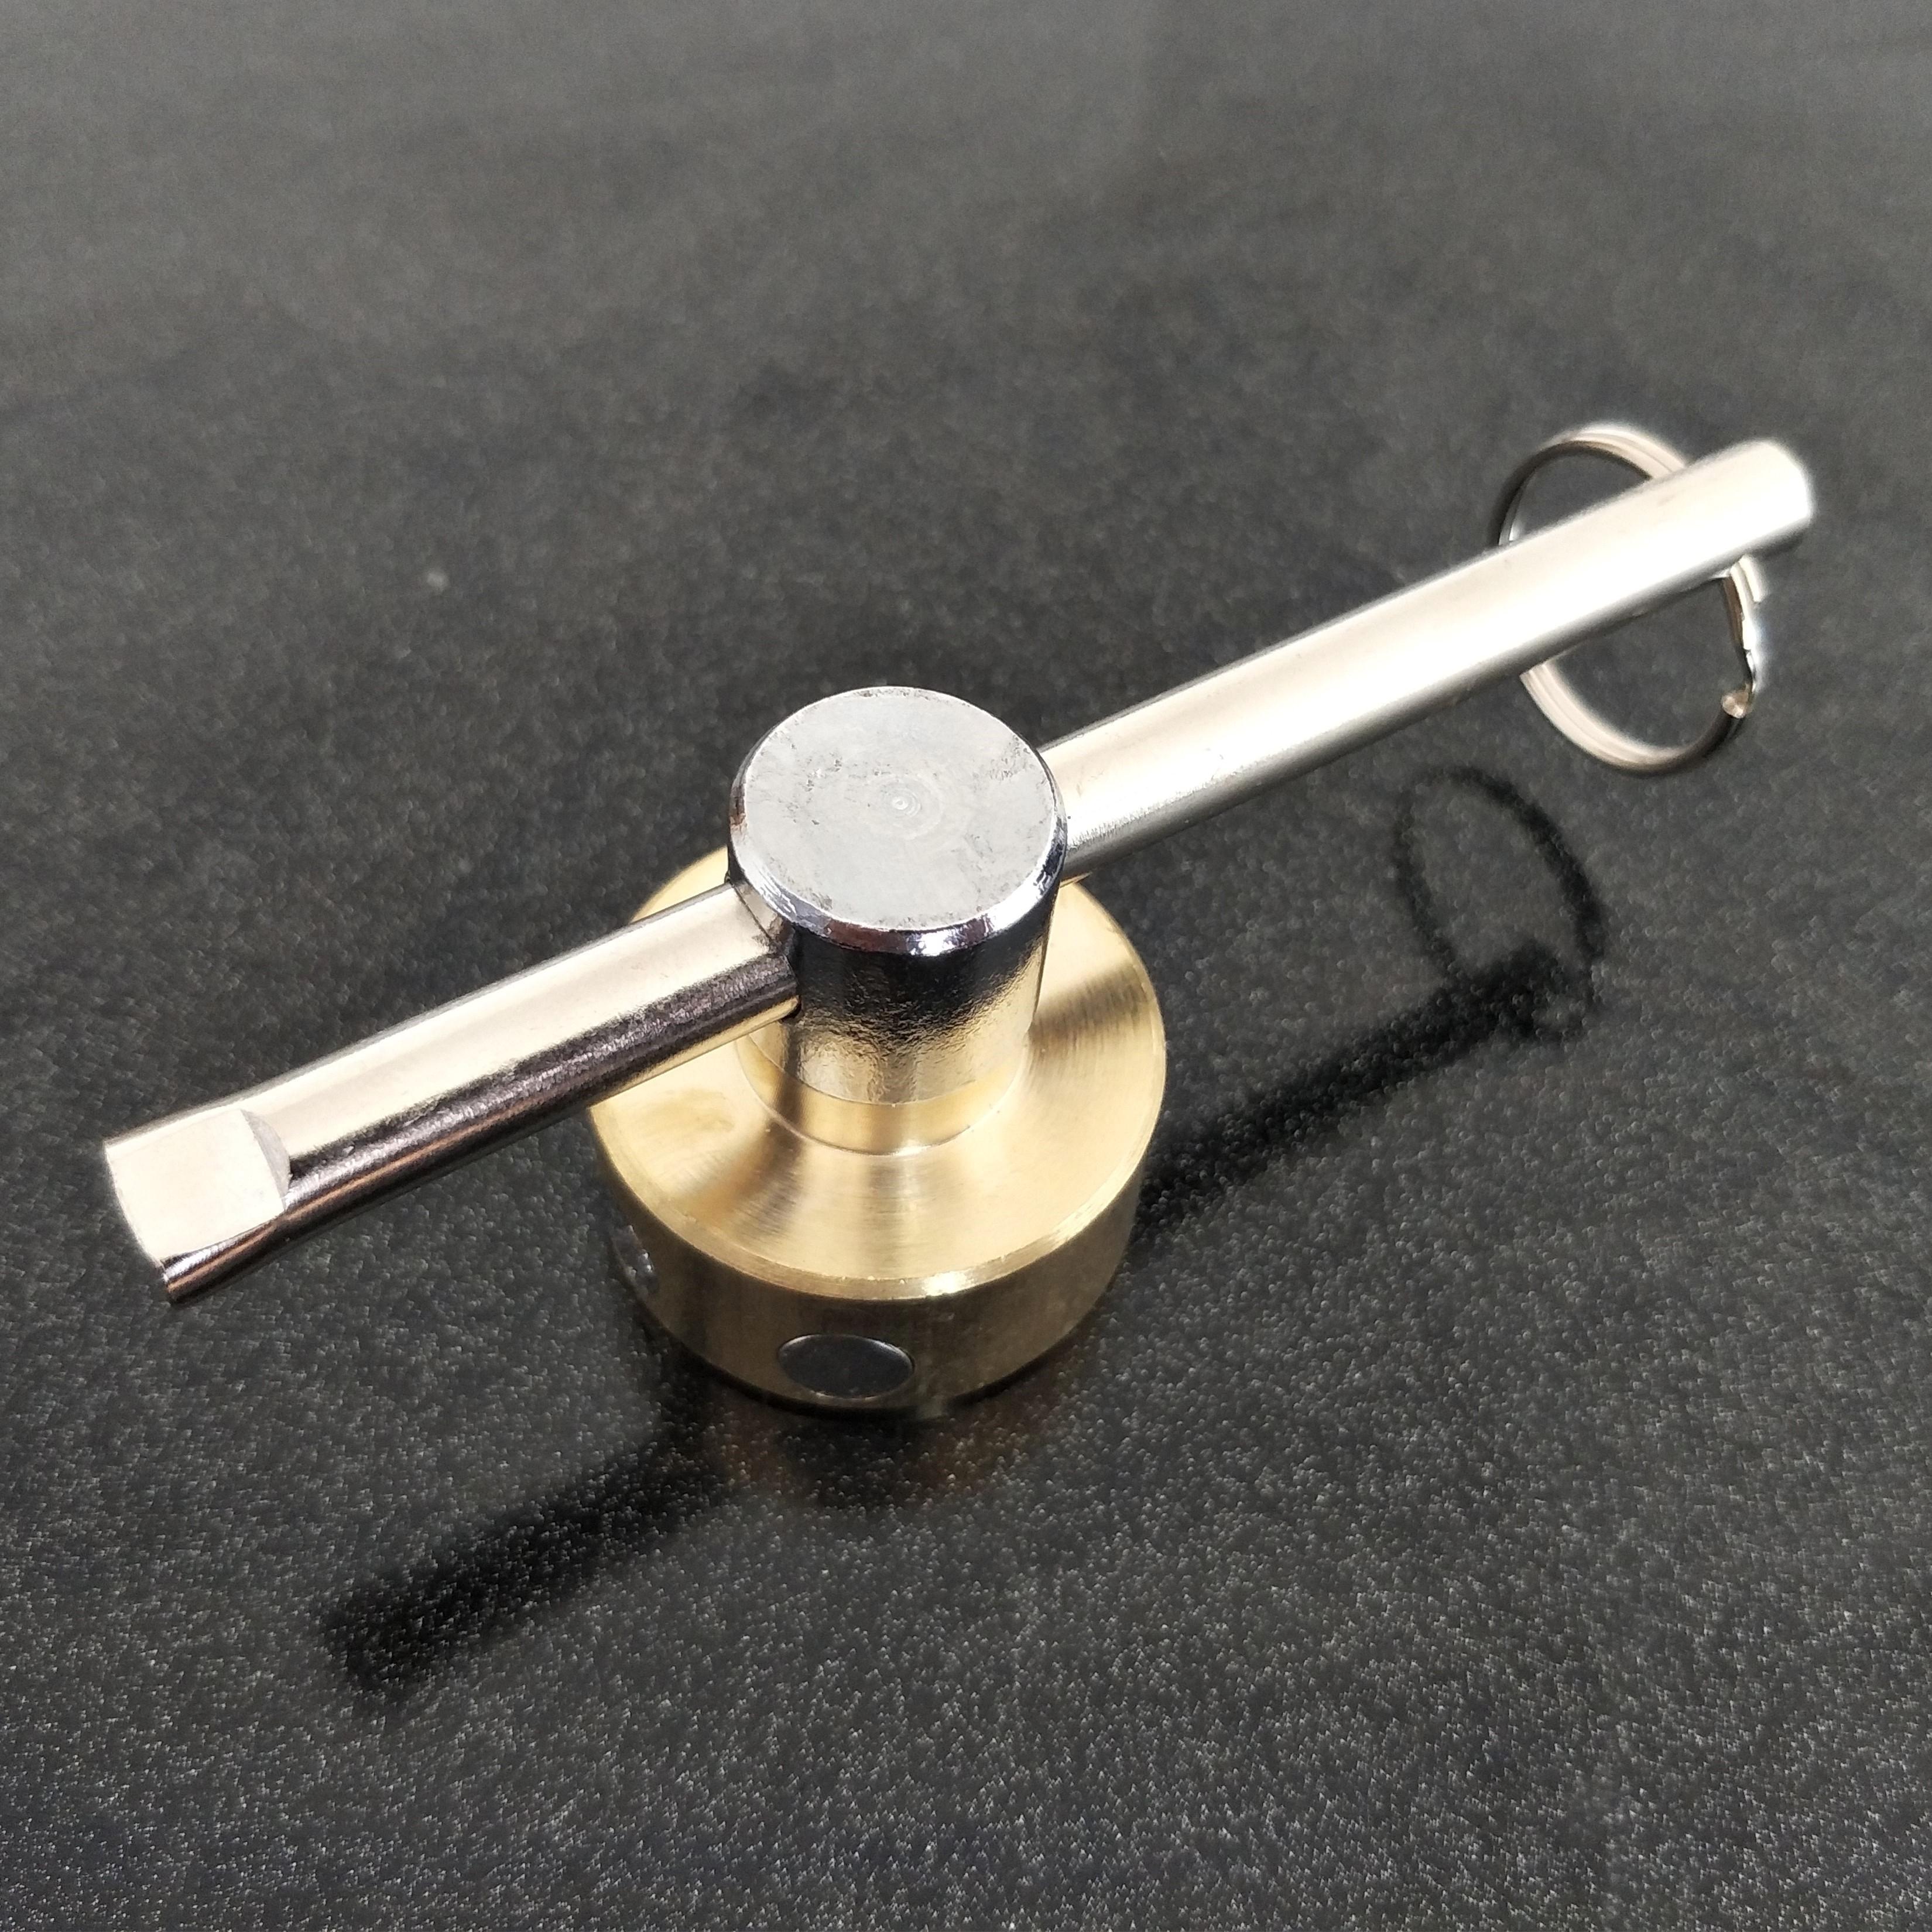 Heating valve general magnetic and magnetic valve key, tap water valve, water meter switch, thermal word lock valve